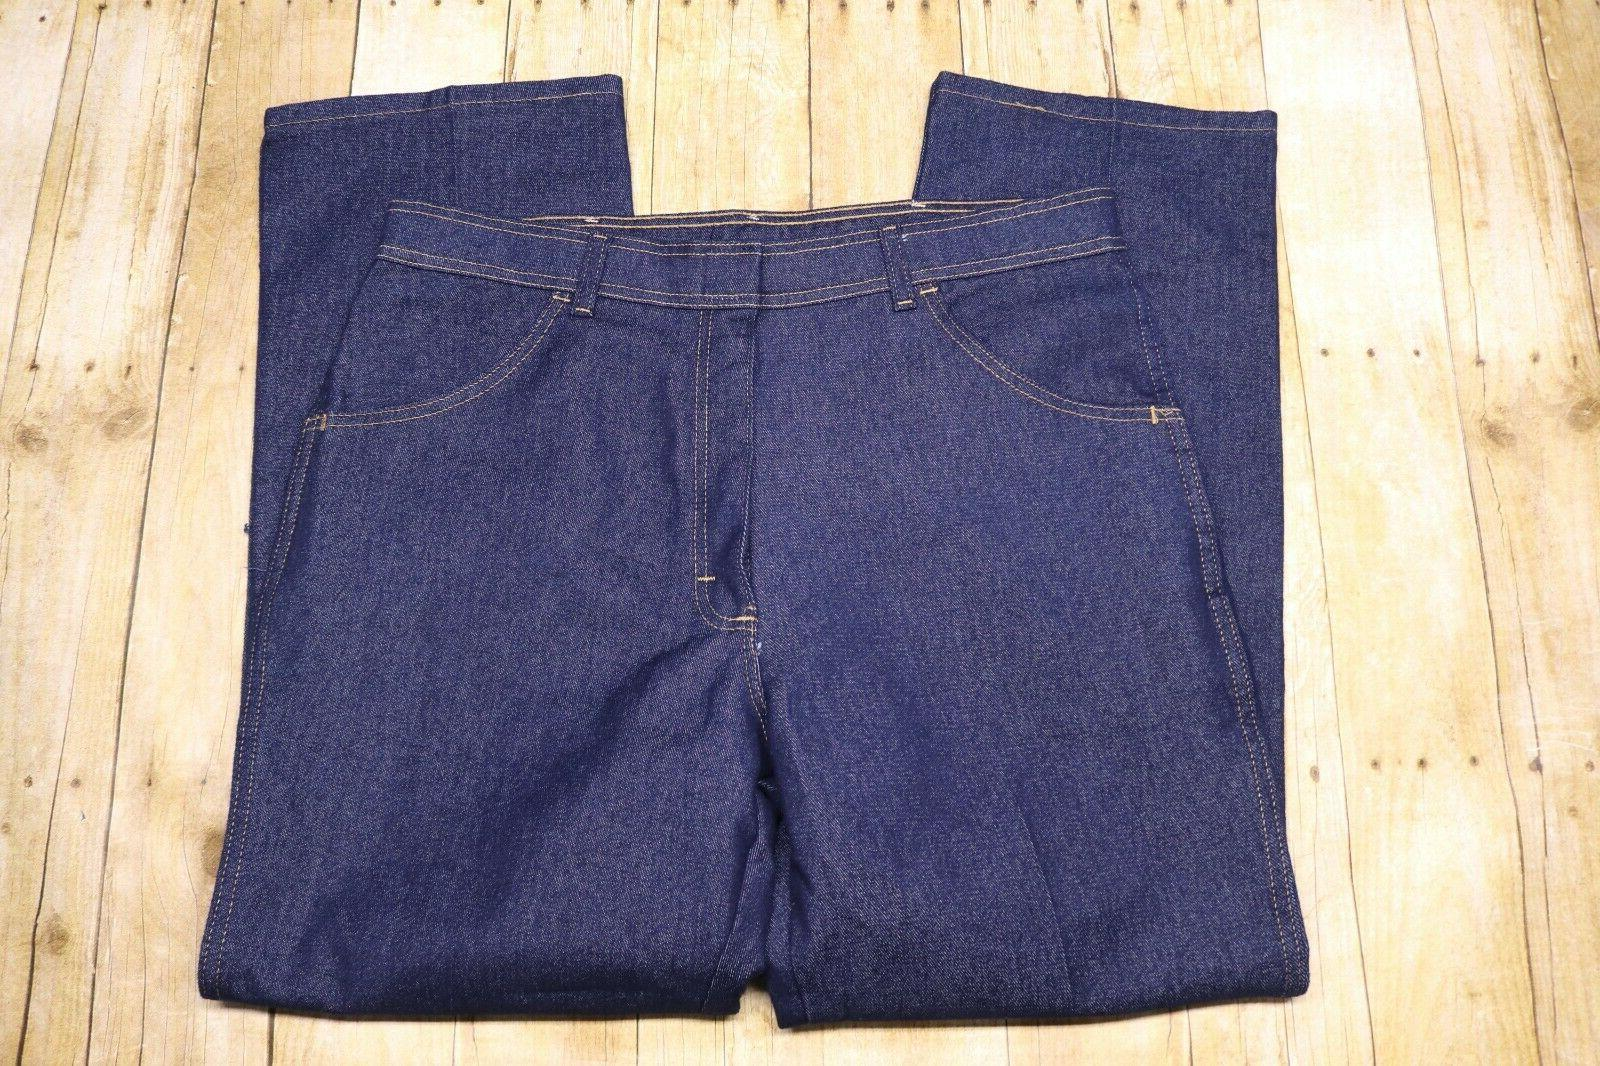 NWT Wrangler five star fit jeans denim